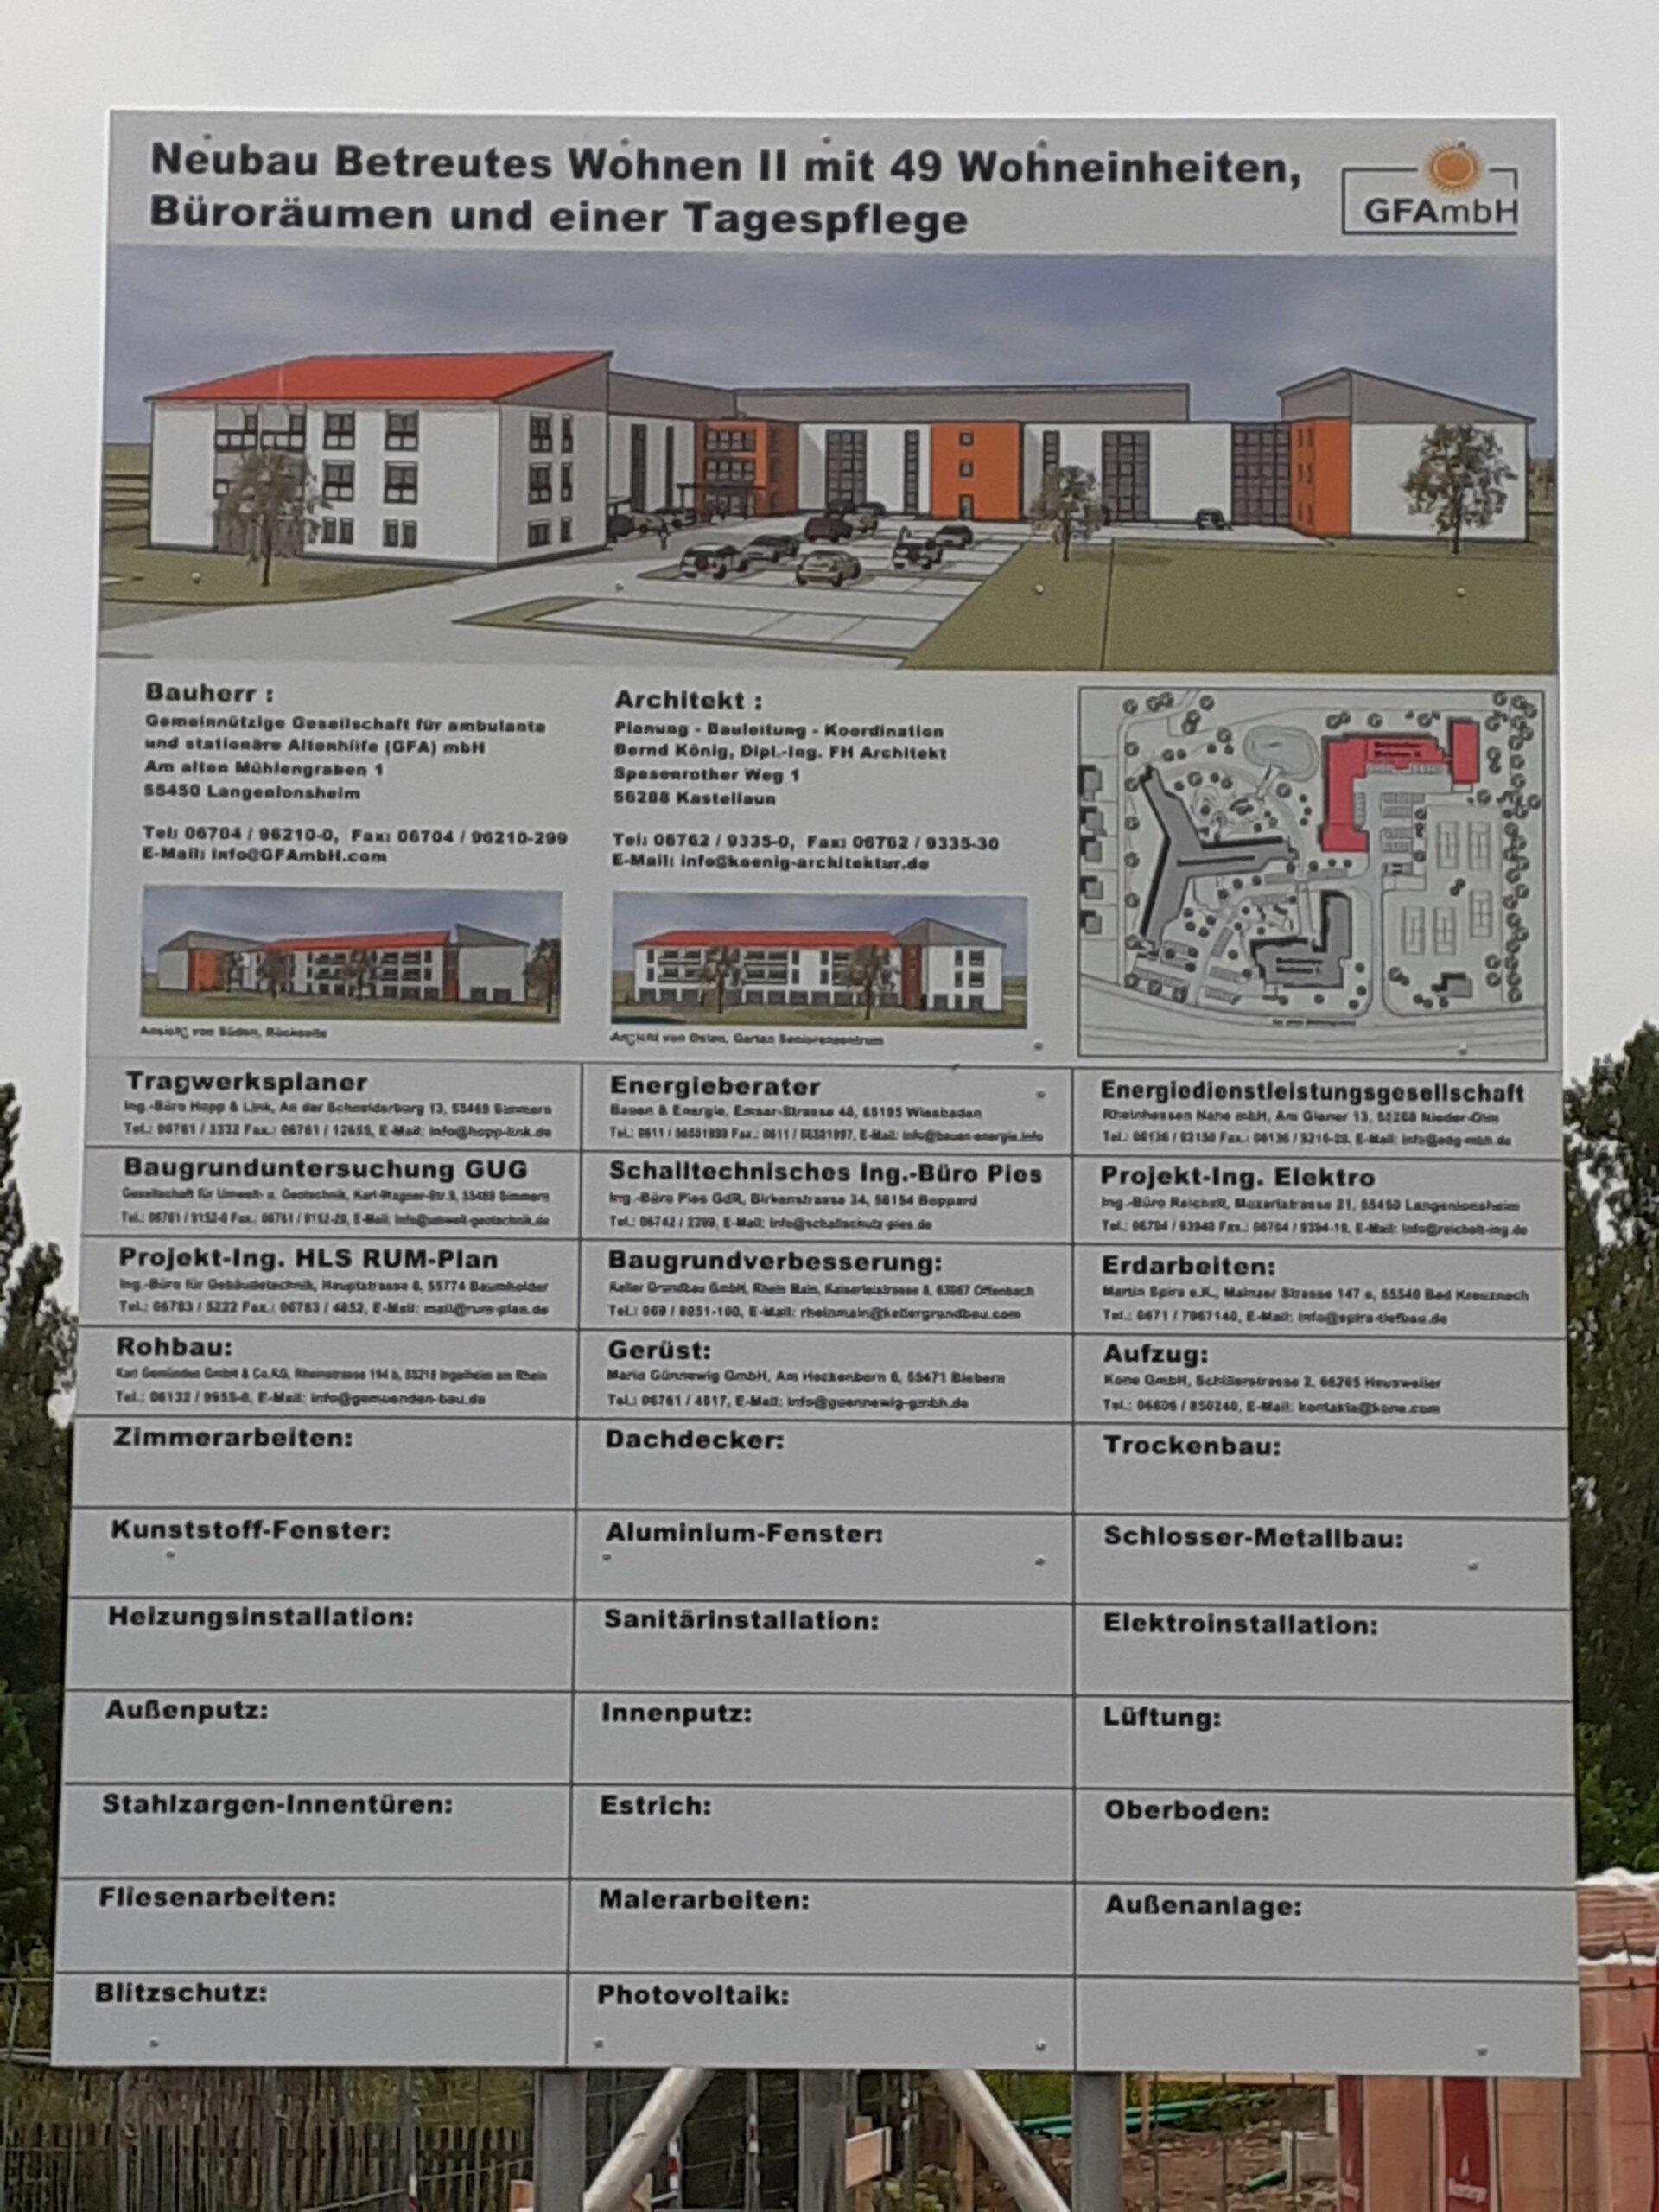 Info-Tafel zum Neubau